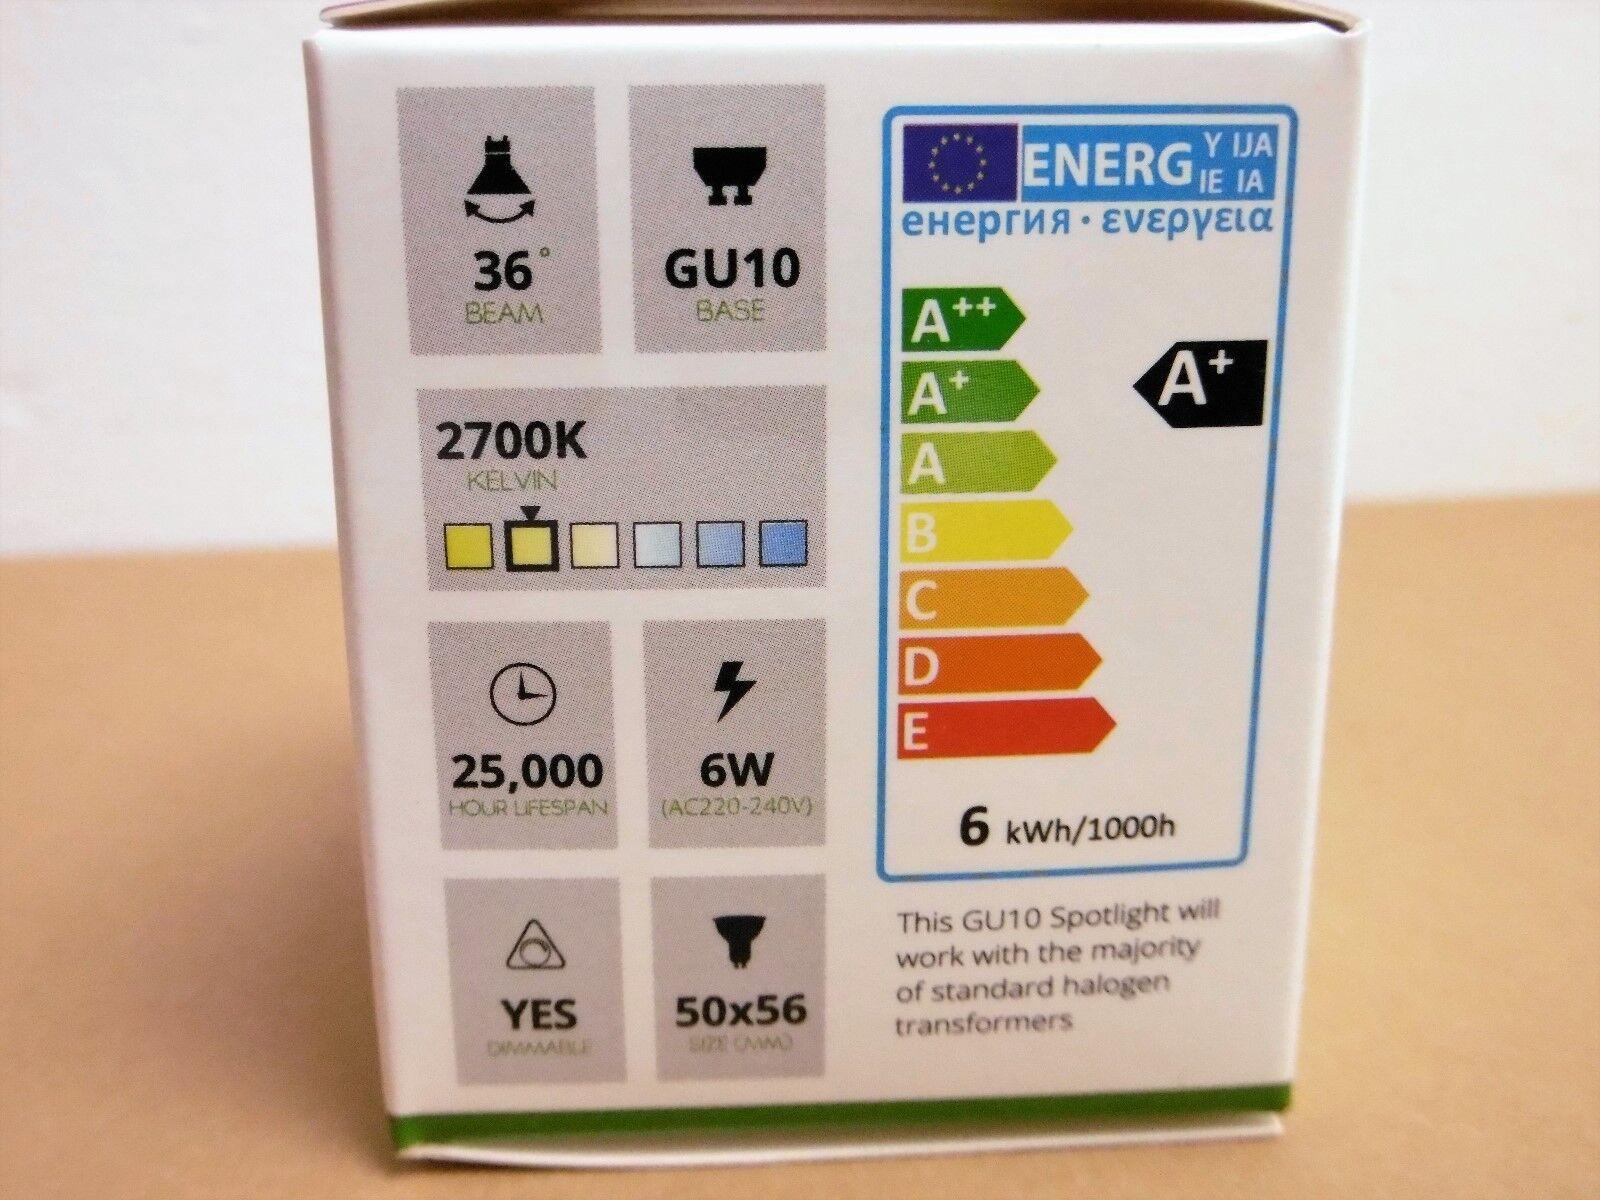 Lot 5 Ampoules led GU10 GU10 GU10 6w/60w 2700k blanc/chaud  420lm DIMMABLE | En Ligne  f41eb6